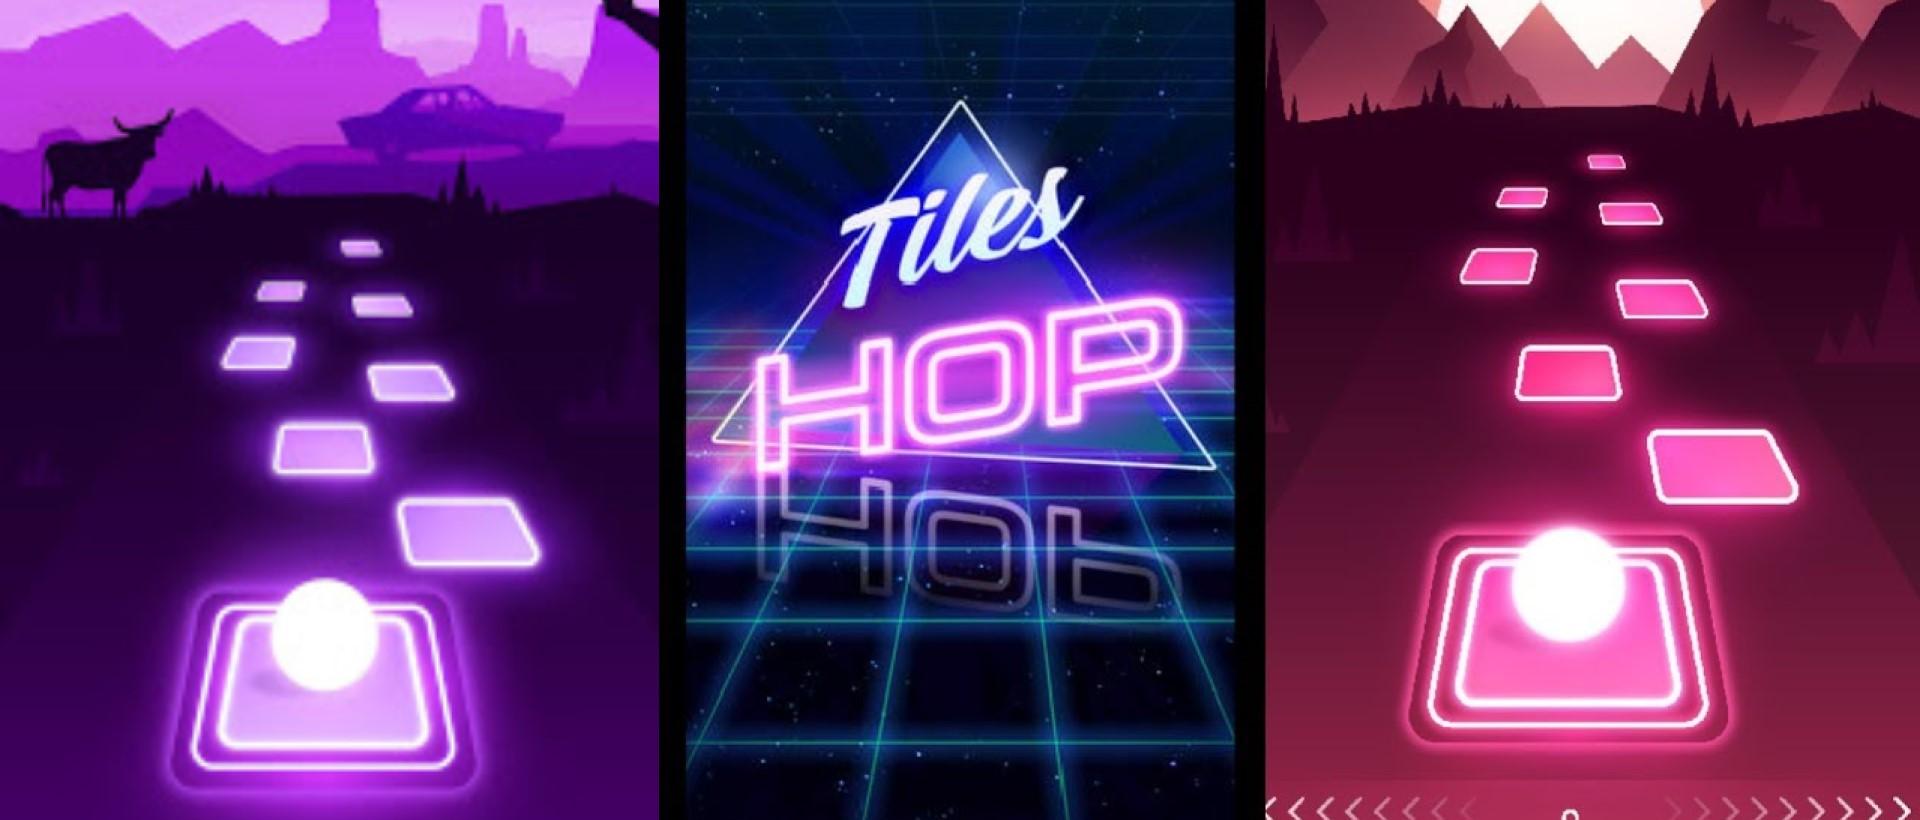 Tiles Hop: EDM Rush!